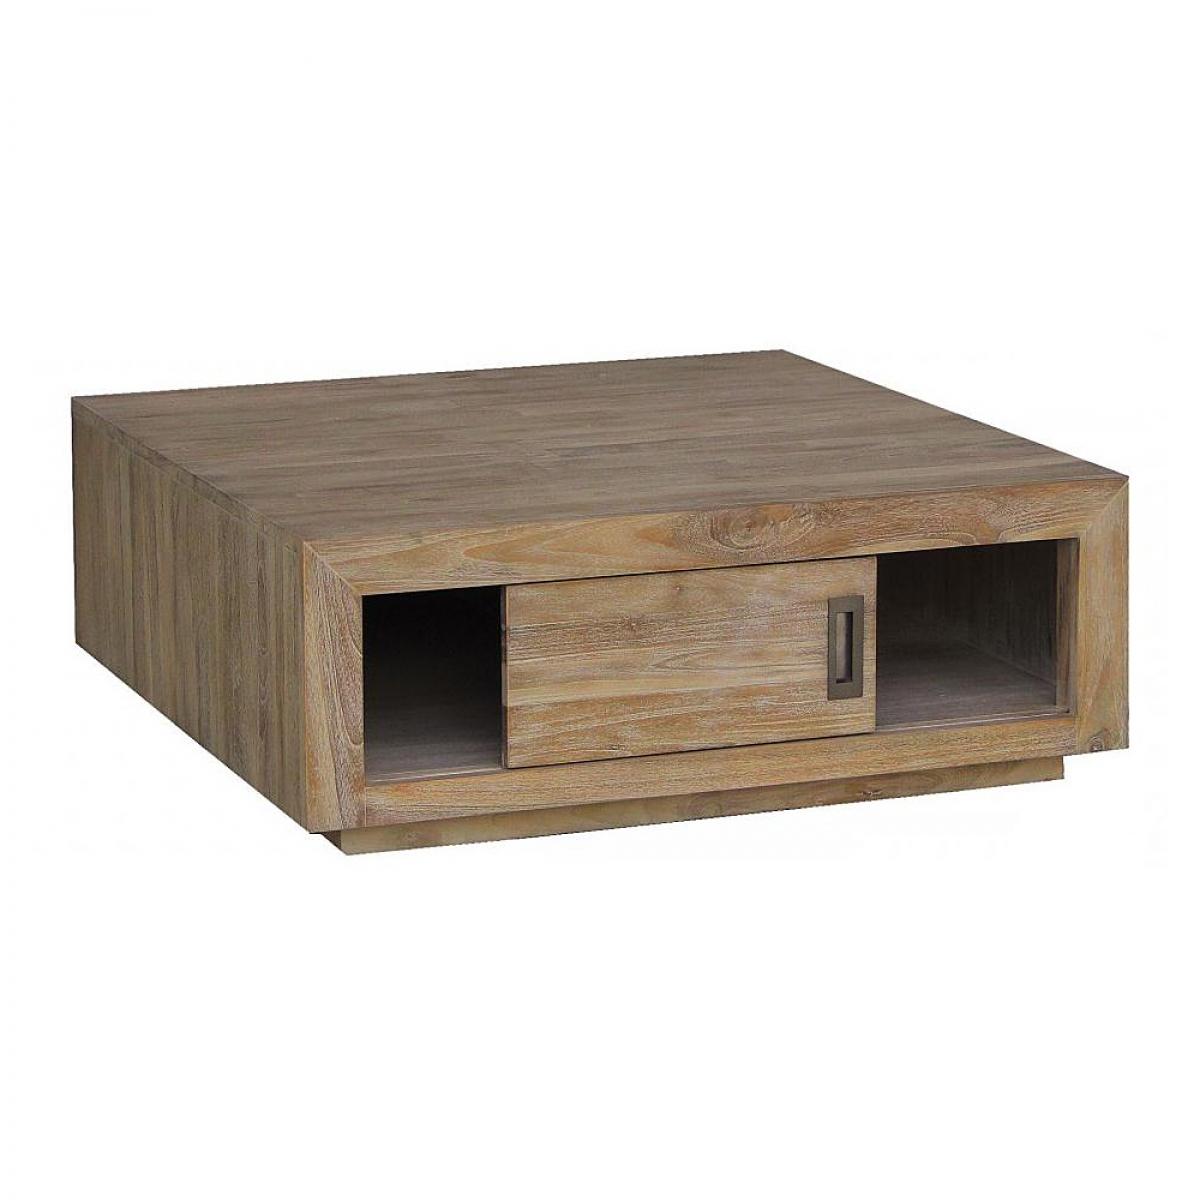 Table basse carree palette - Ikea table basse carree ...